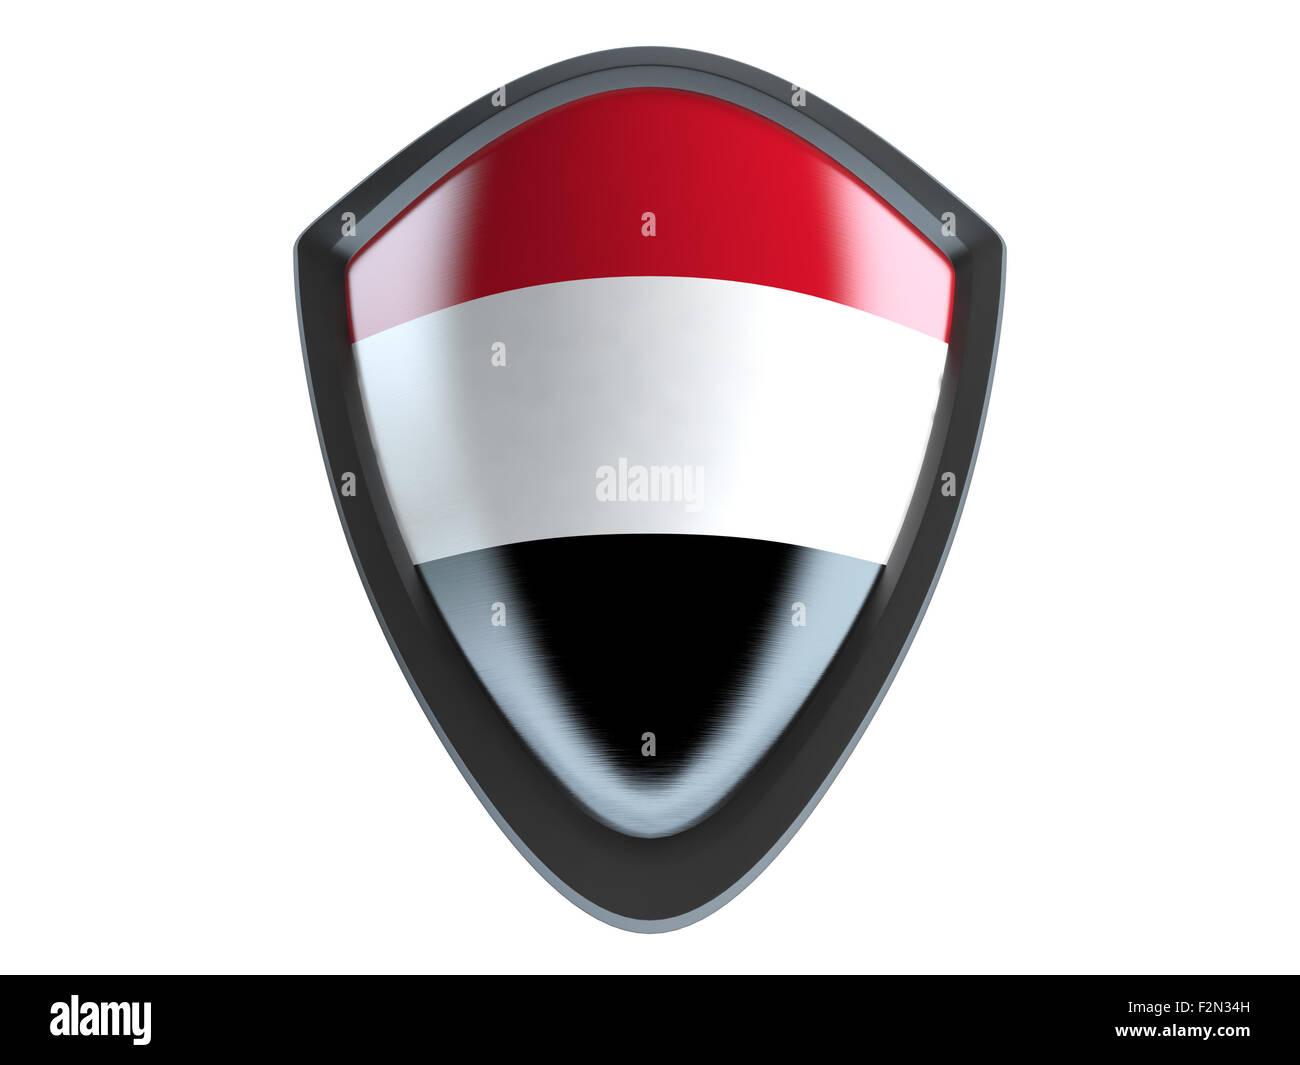 Yemen flag on metal shield isolate on white background. - Stock Image